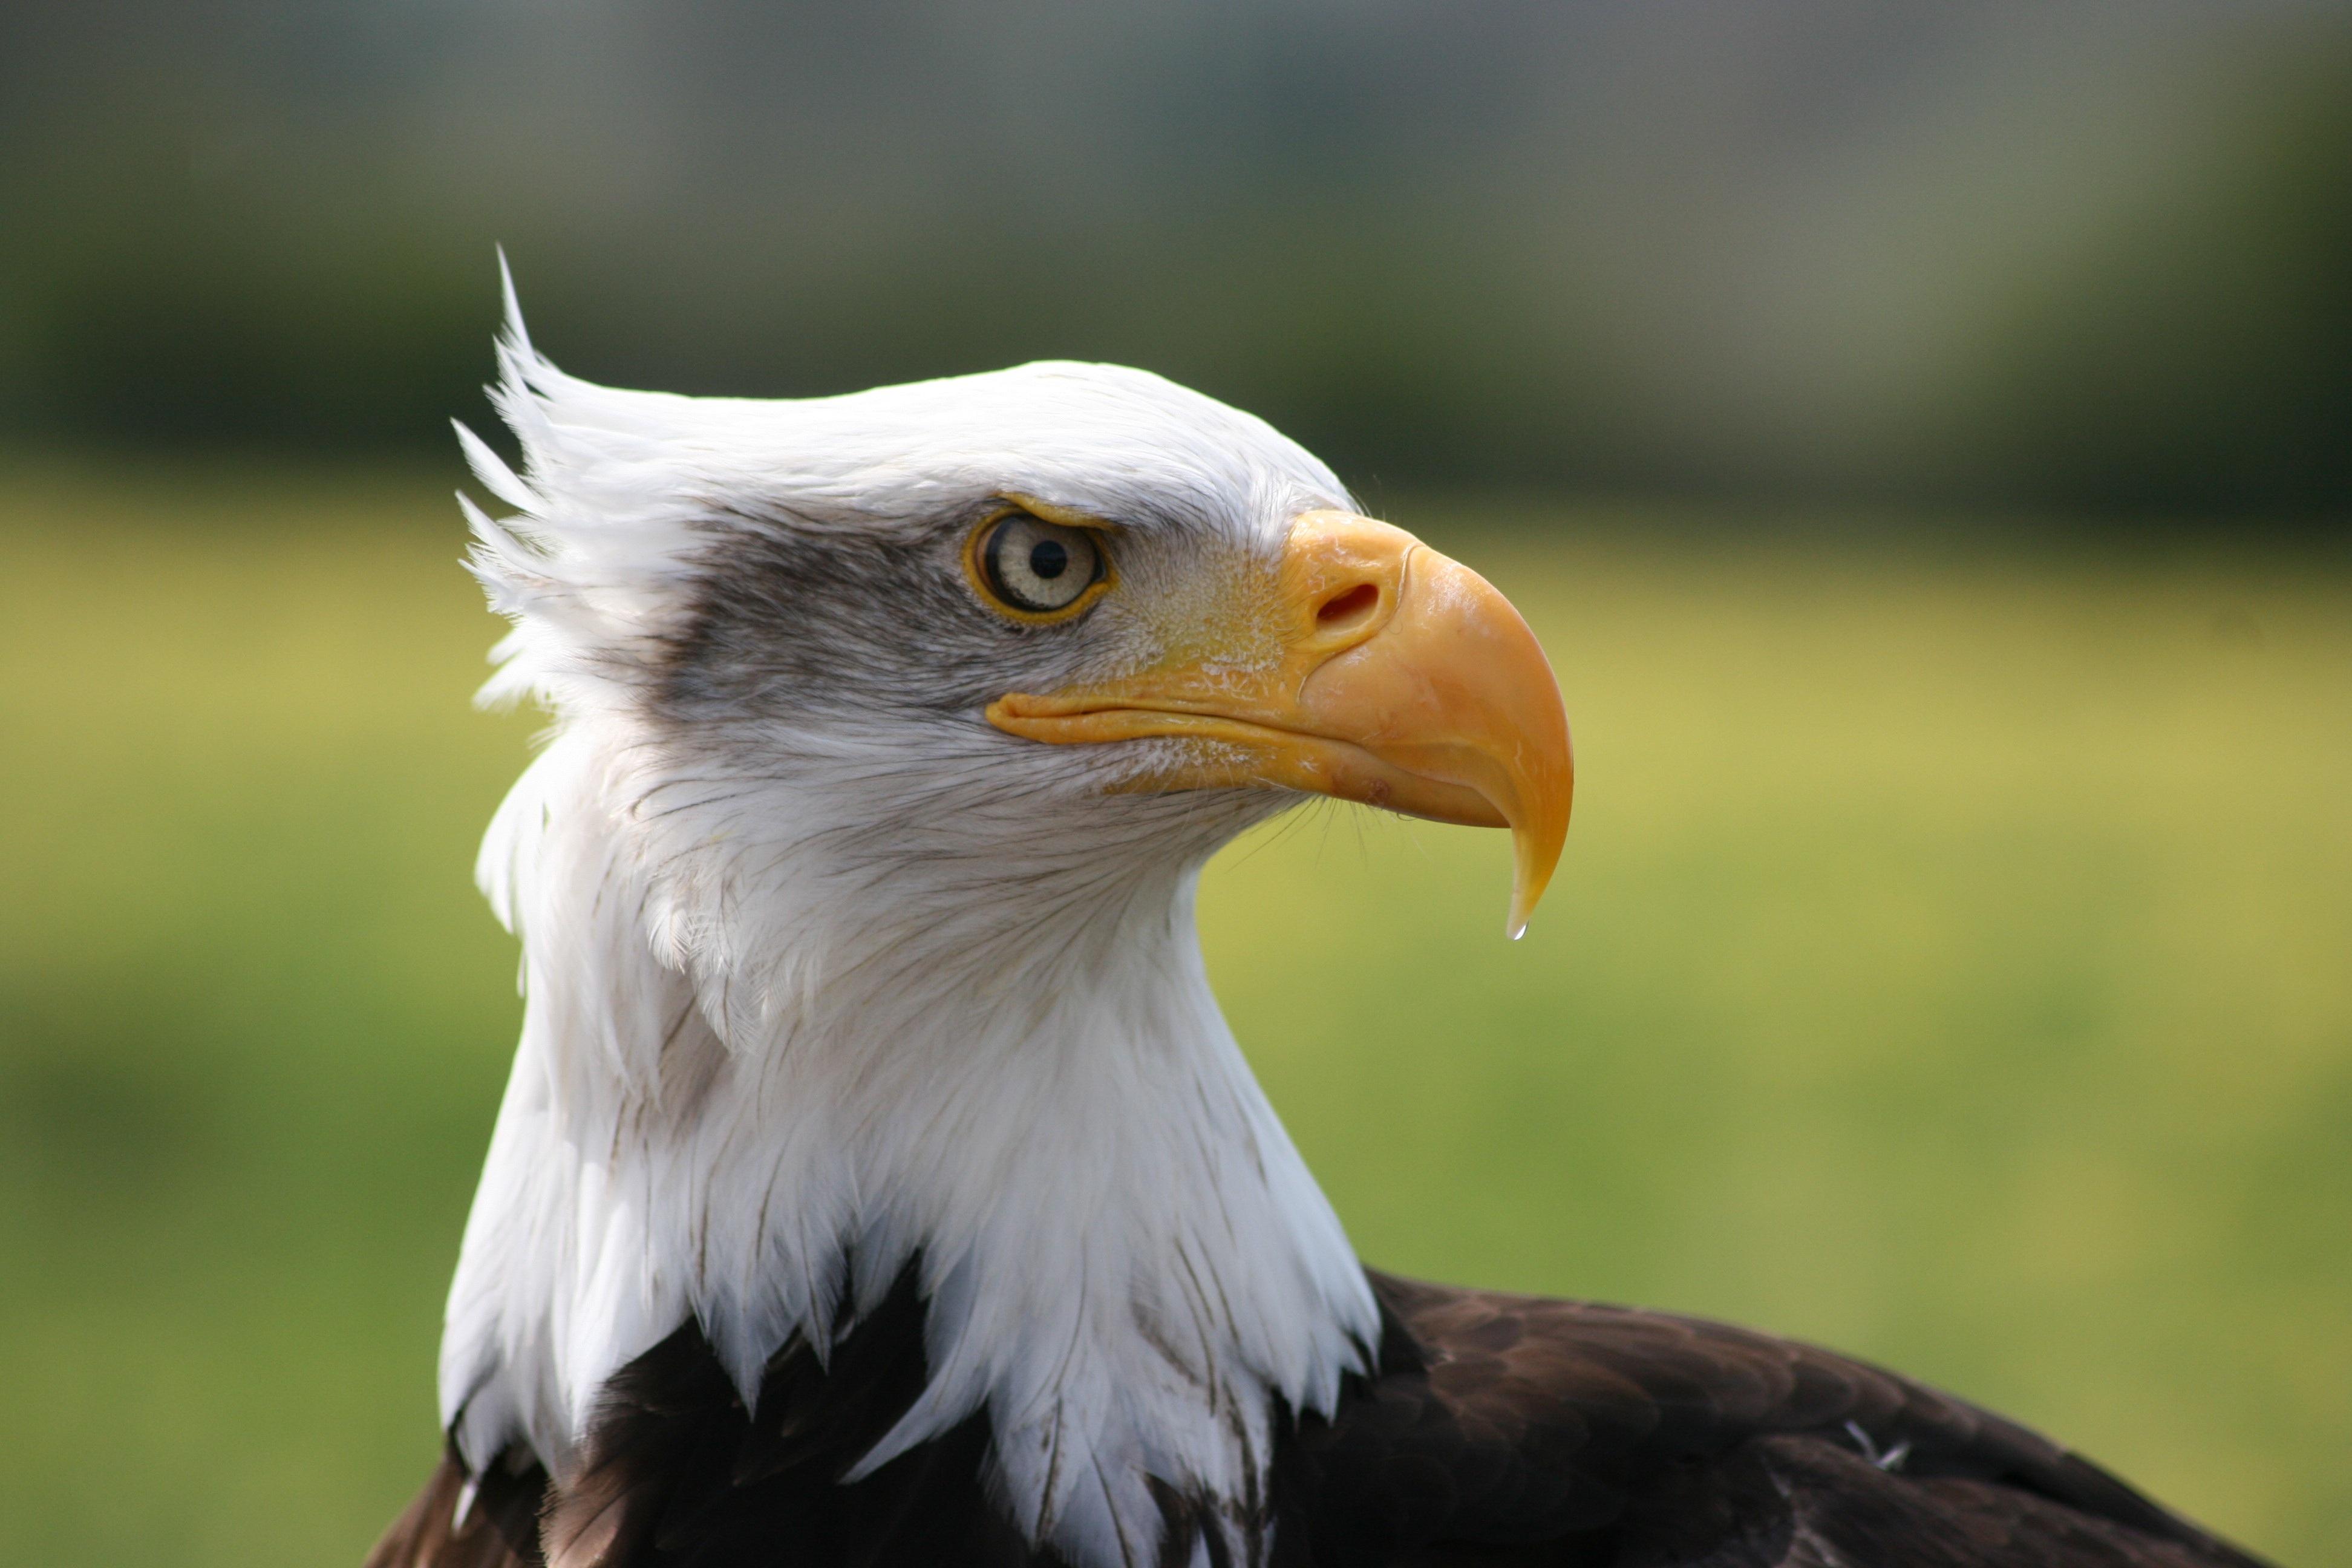 140382 descargar fondo de pantalla Animales, Águila, Pájaro, Depredador, Pico: protectores de pantalla e imágenes gratis